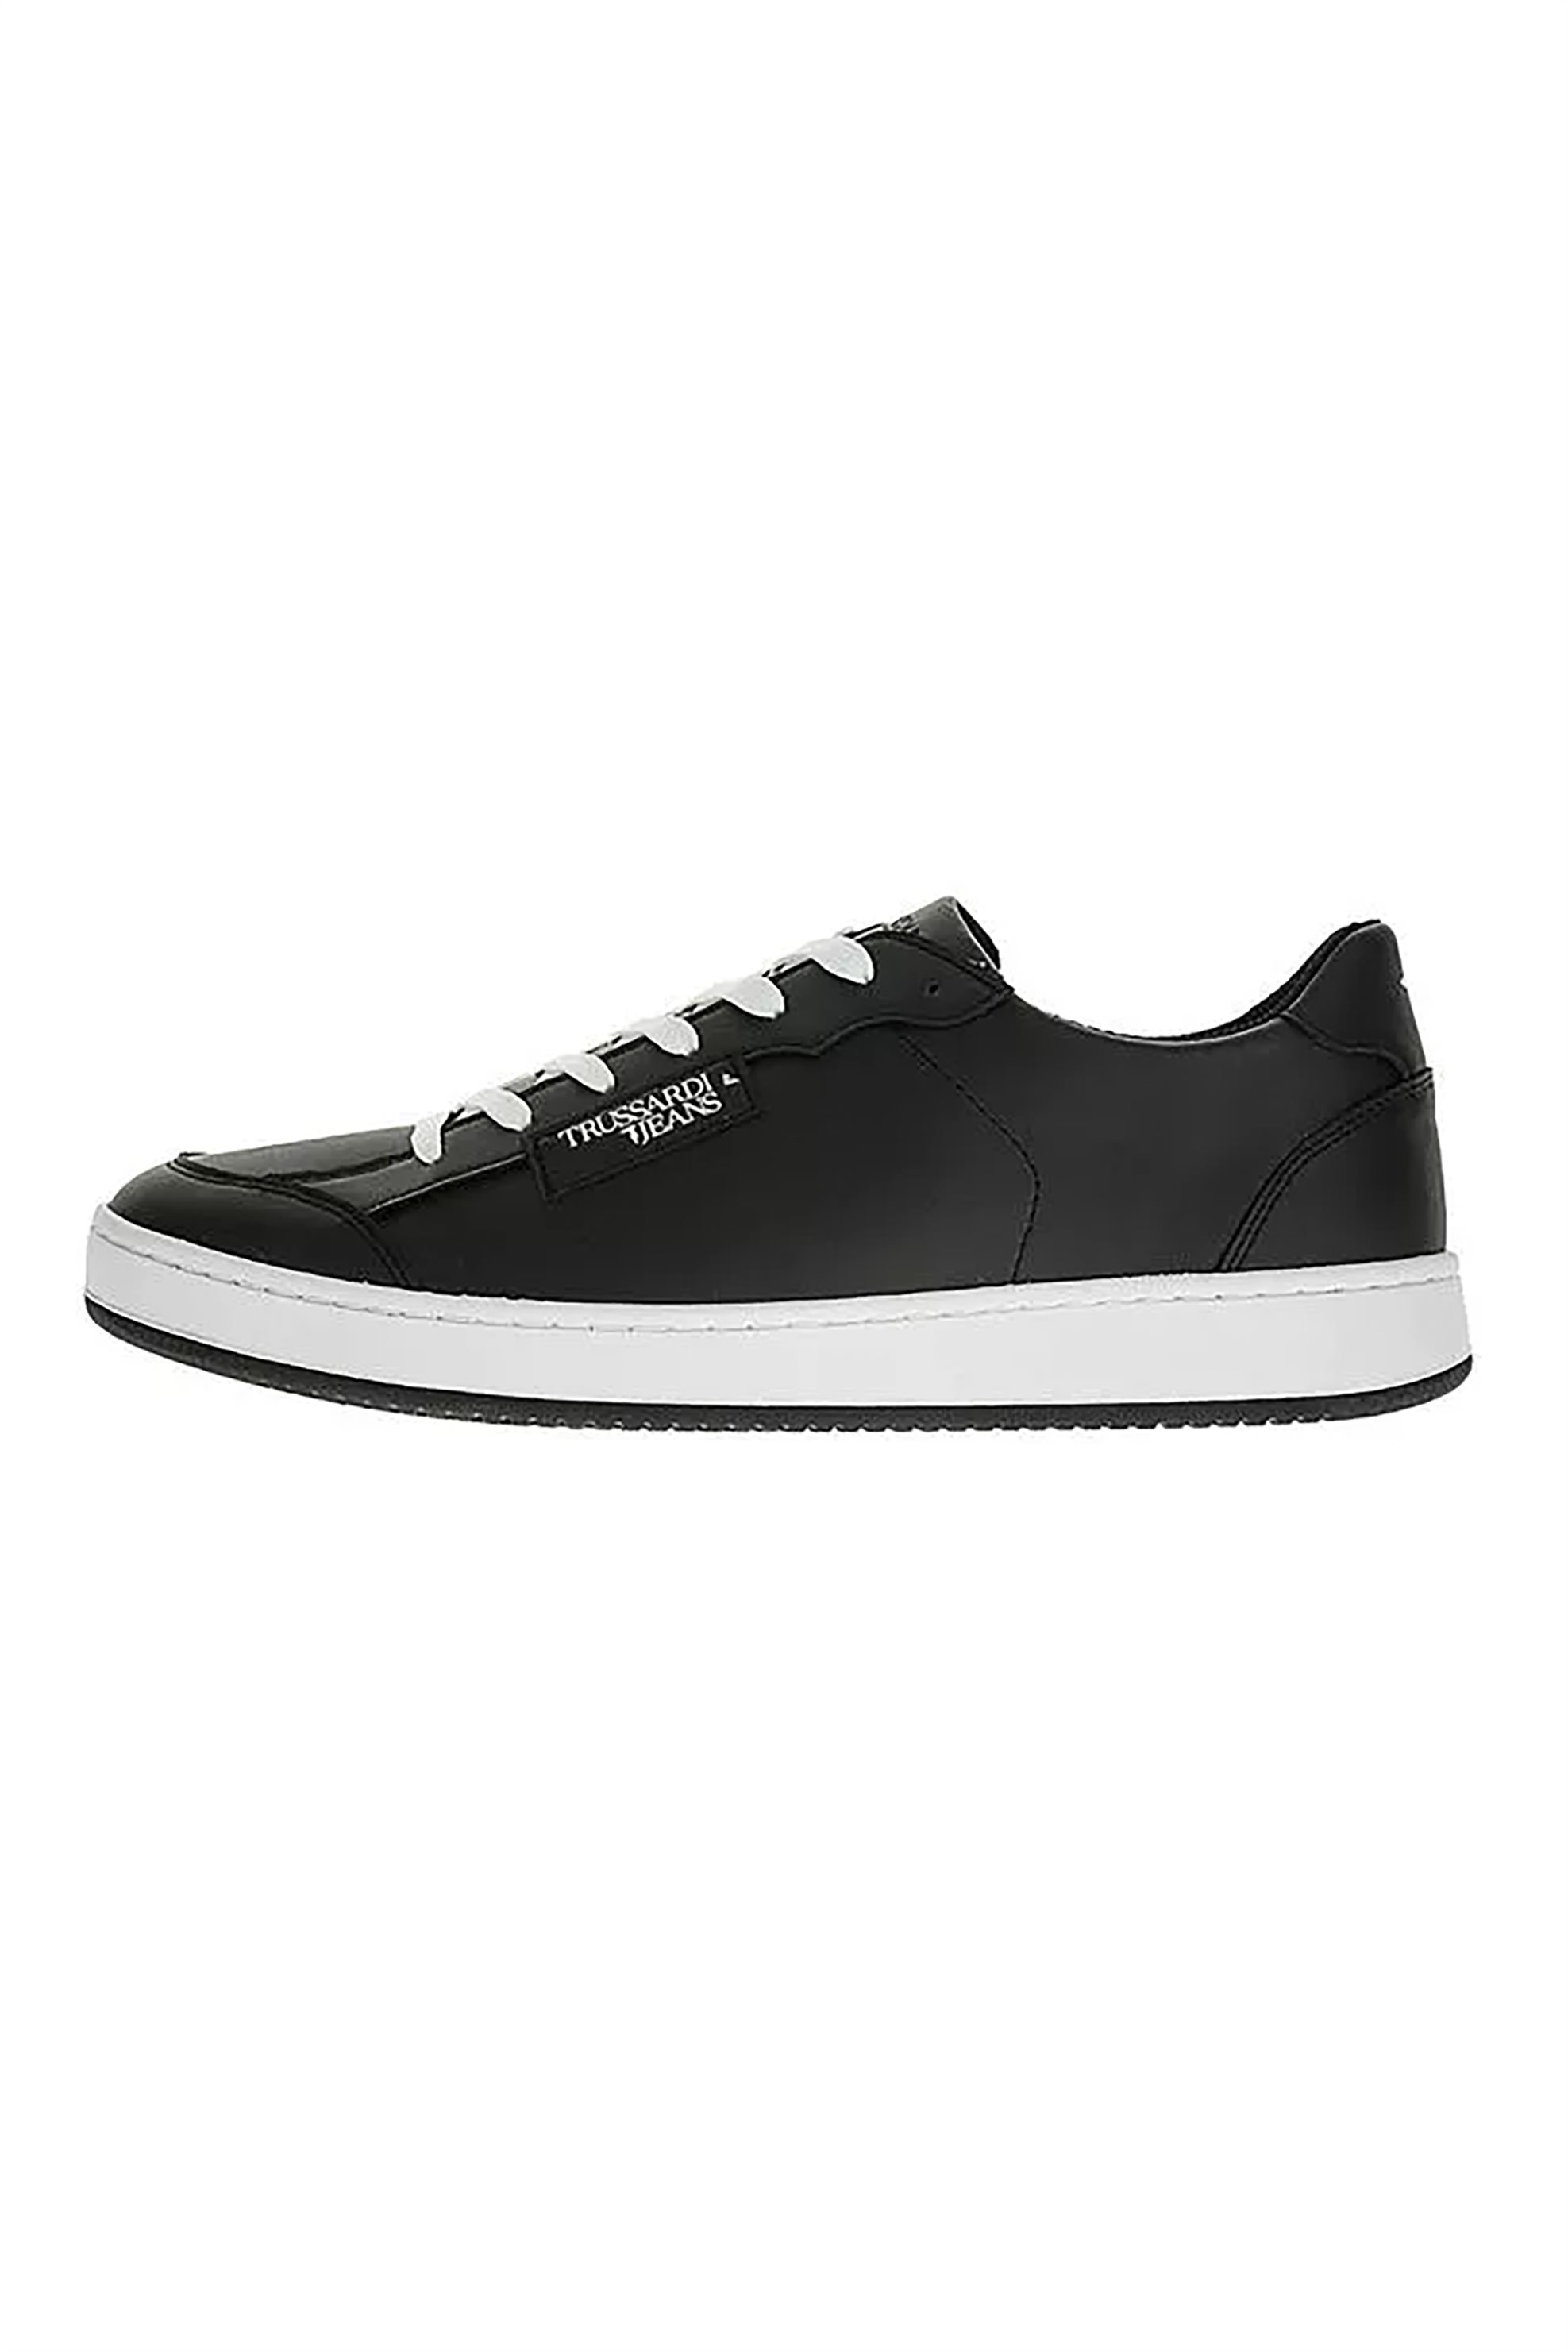 Trussardi ανδρικά sneakers με logo print – 77A00131-9Y099999 – Μαυρο